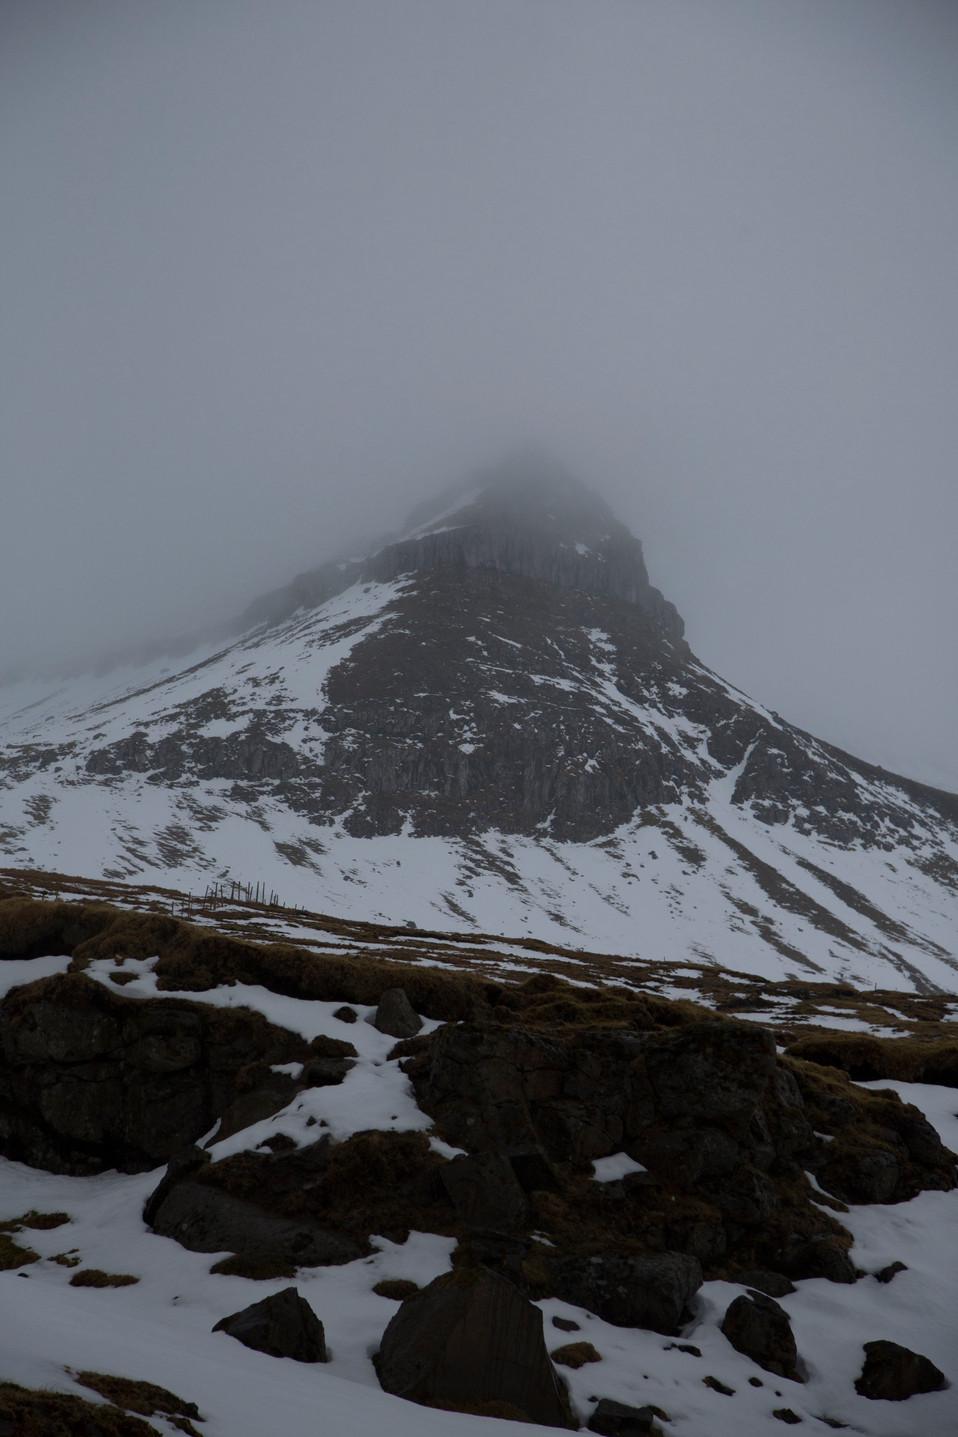 Moody Mountain Peak